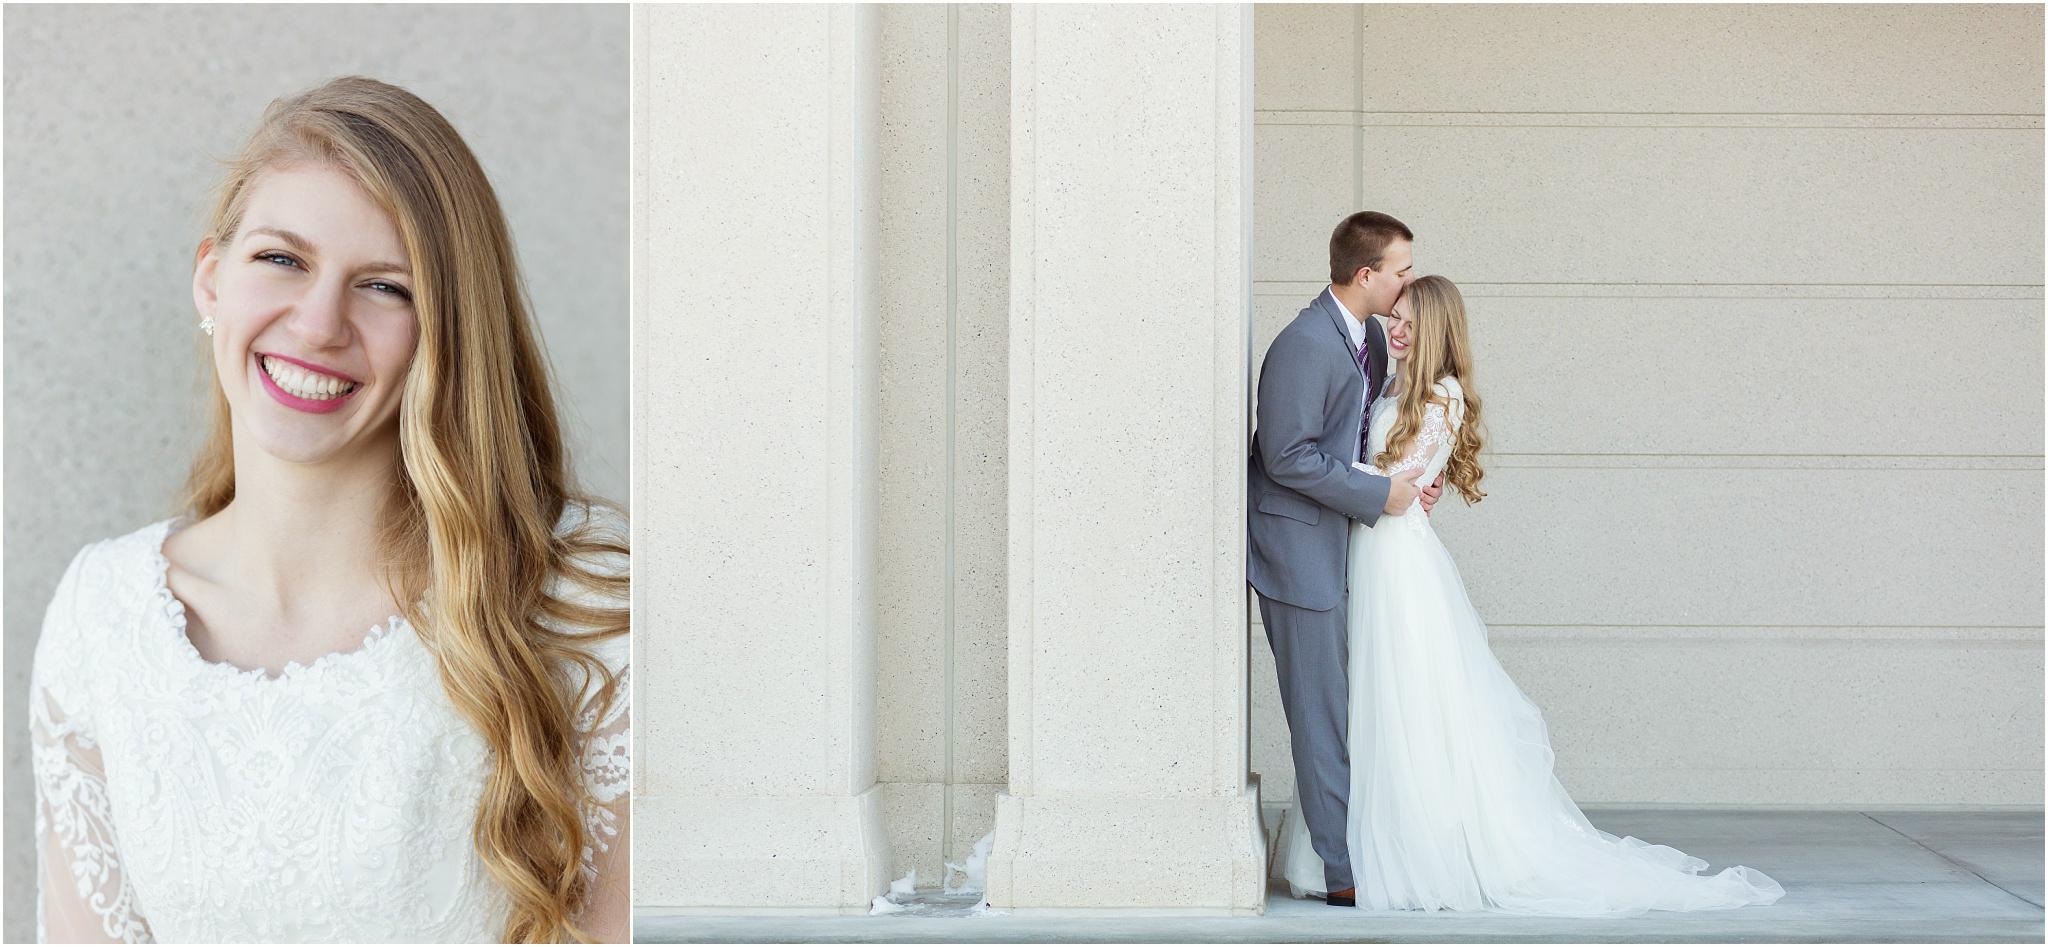 Wedding Photography_Meridian Idaho Temple_Boise Idaho_Leah Southwick Photography_0003.jpg